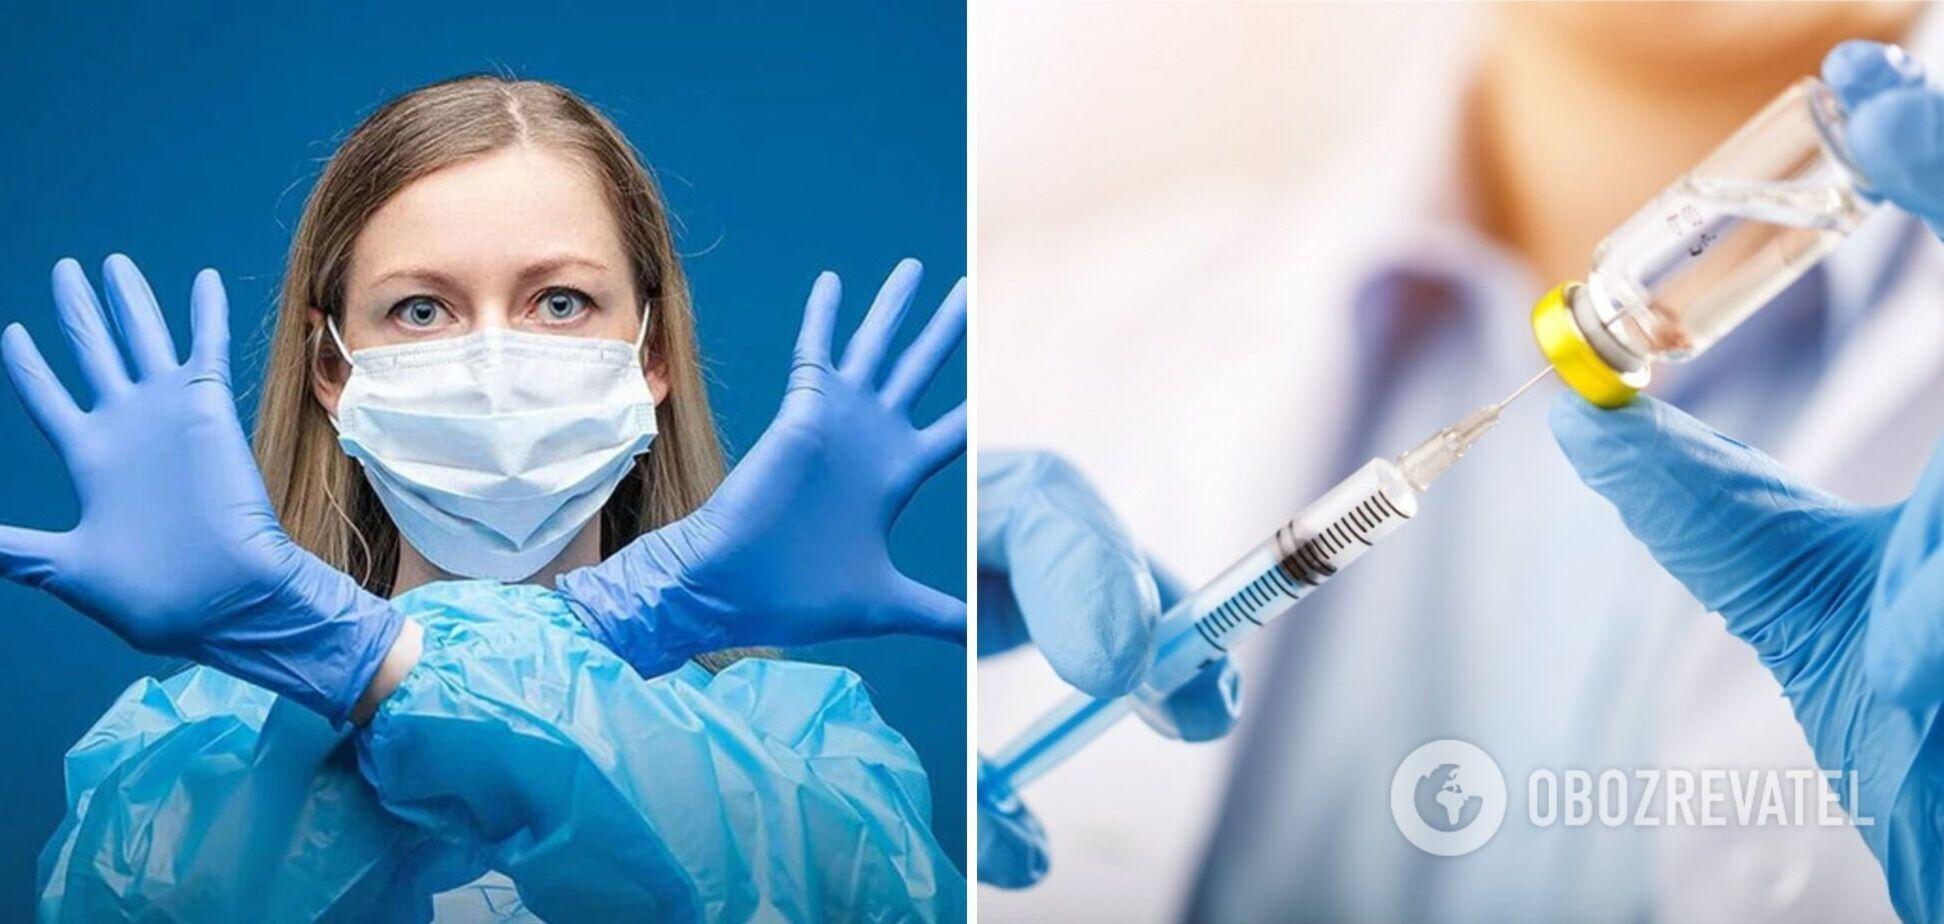 Минздрав опровергает 5 мифов о вакцинации